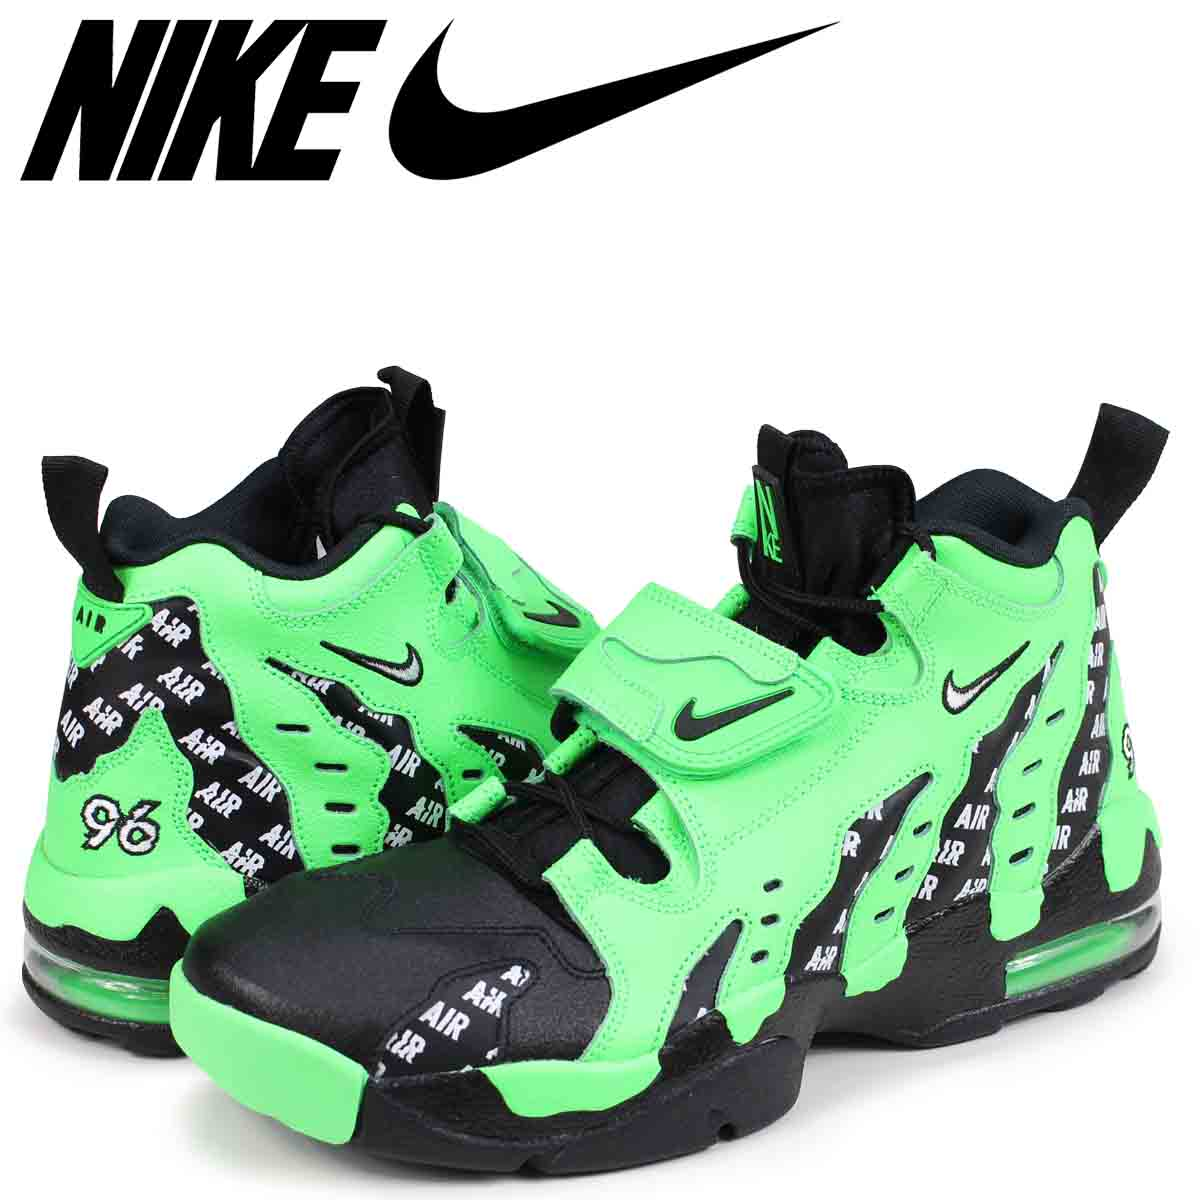 f010f177762 SneaK Online Shop  NIKE AIR DT MAX 96 Nike air DT max 96 sneakers ...